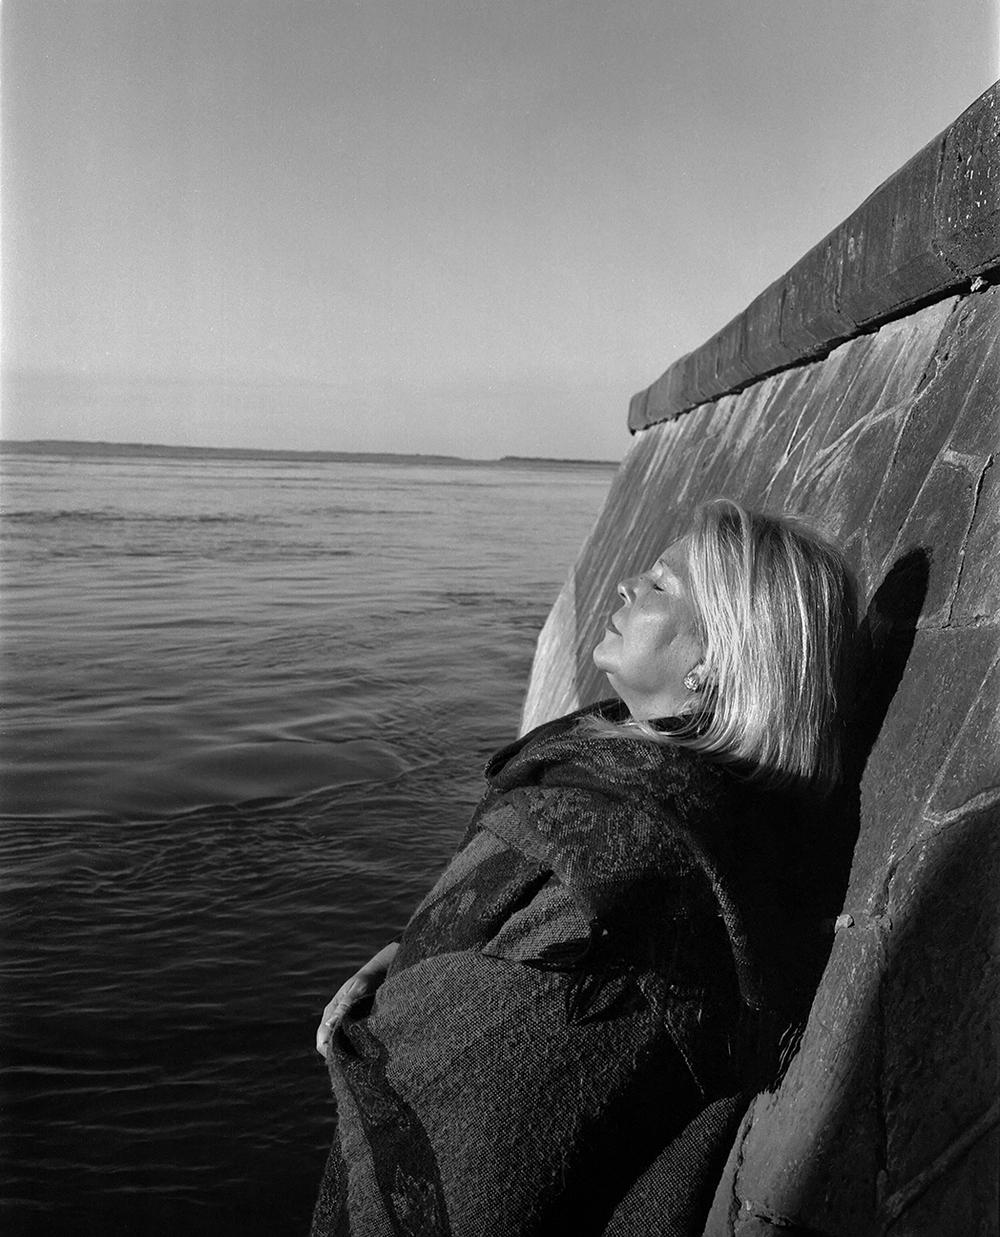 Lilita Carrio on the coast of the Paraná River, Argentina, 2008.